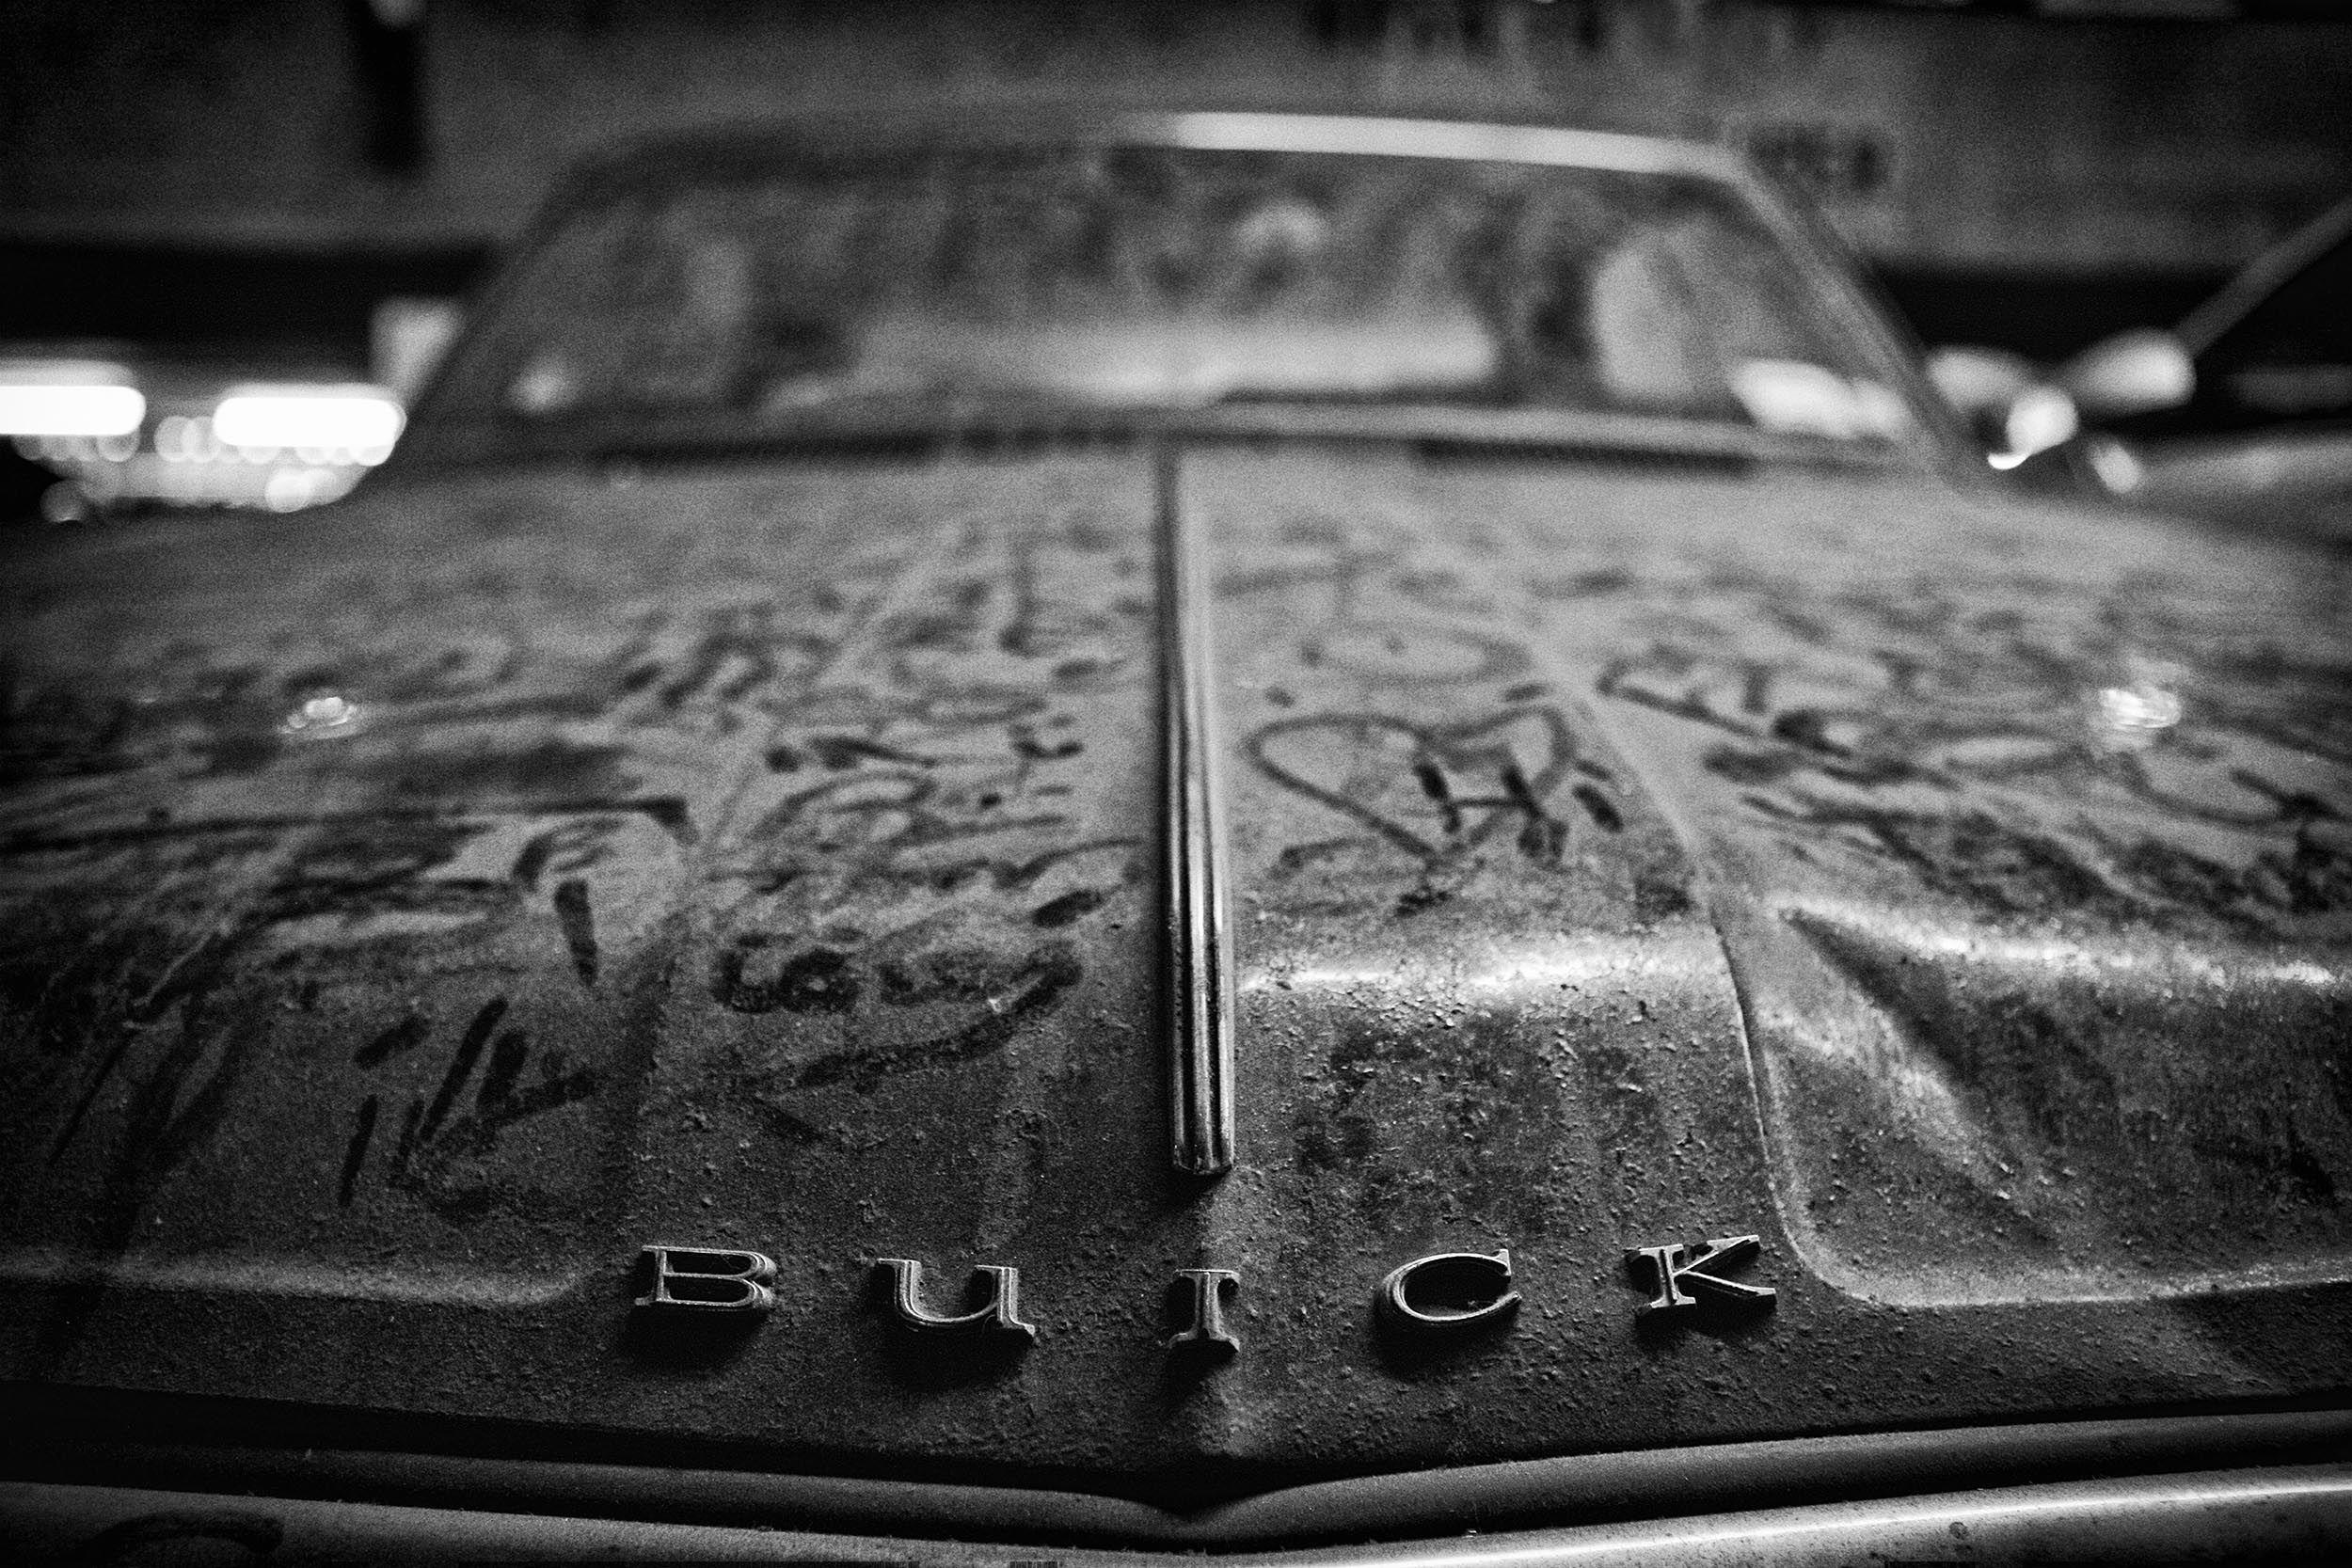 renzi-hawkens_Buick5659.jpg